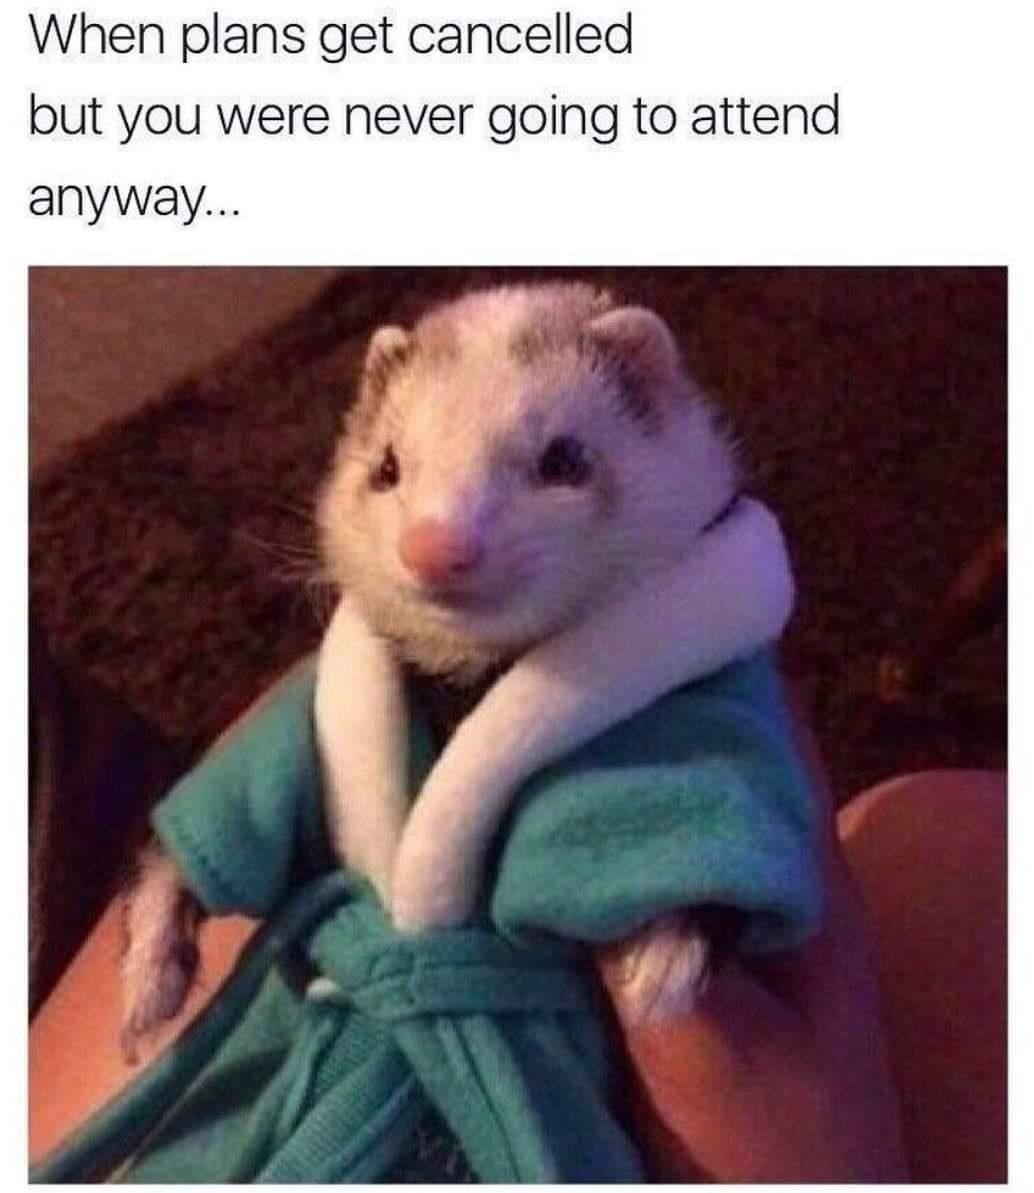 every friday - meme